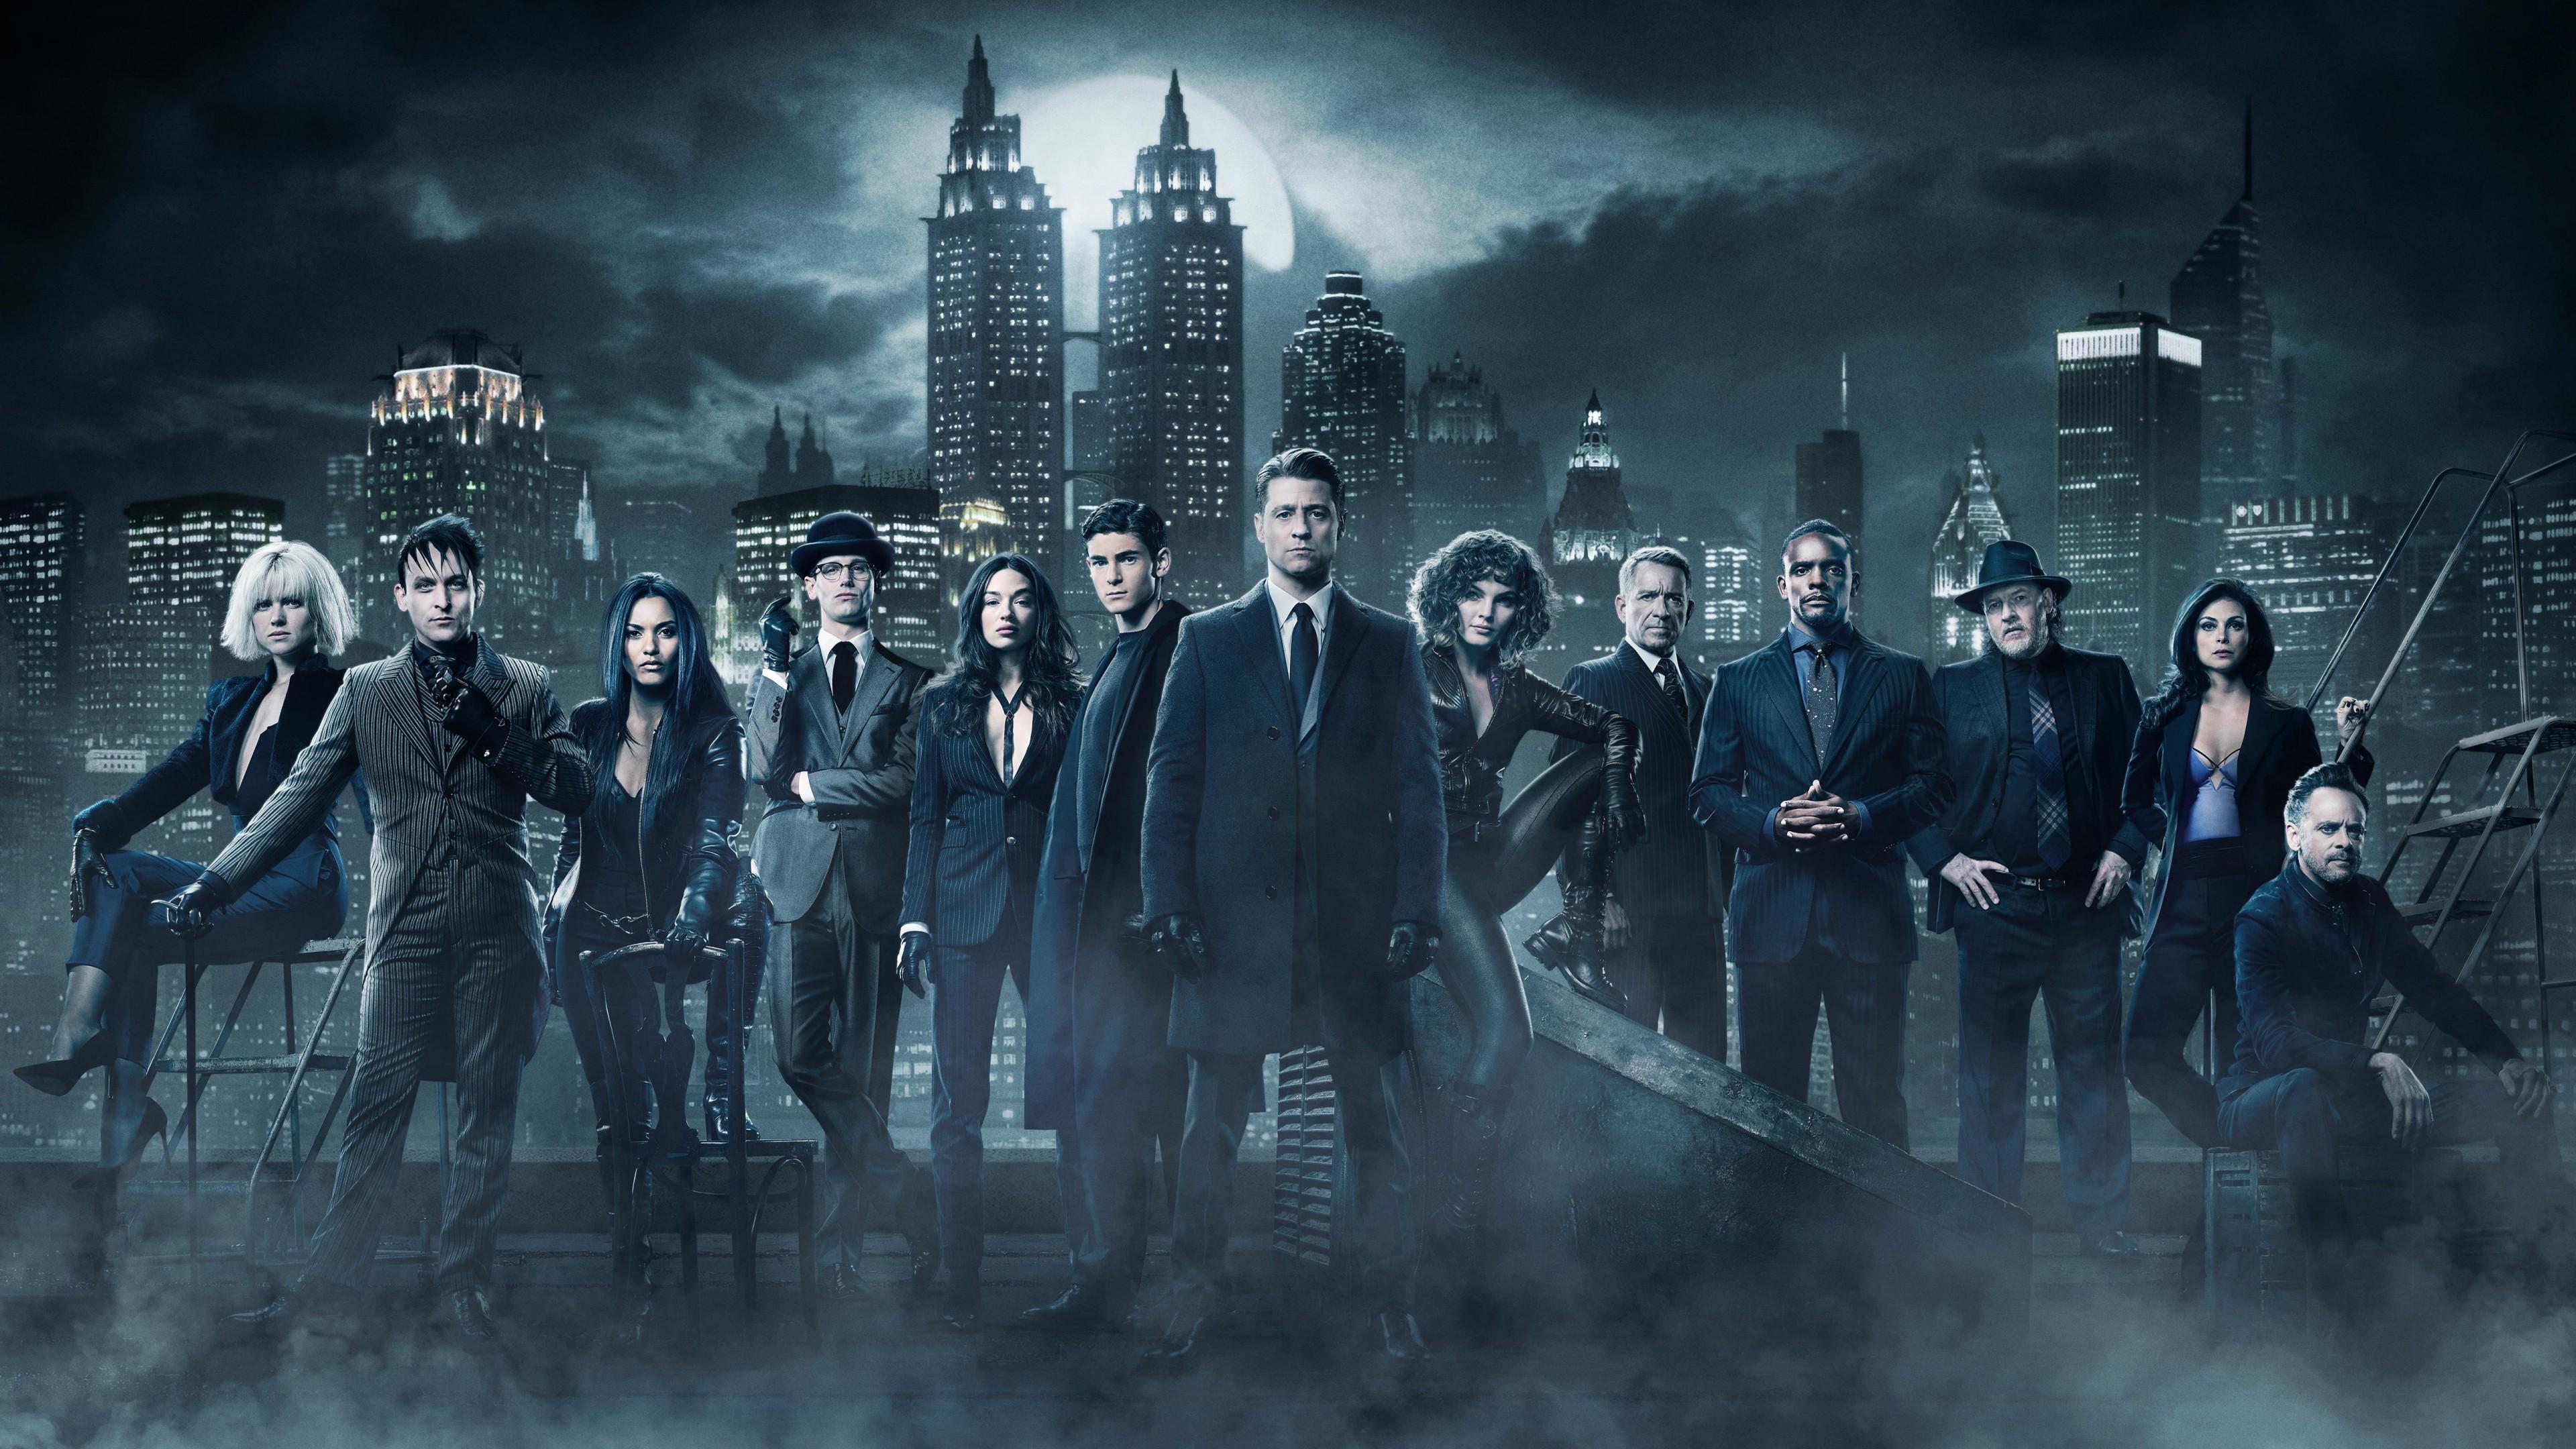 Pretty Little Liars Iphone Wallpaper Gotham Season 4 Cast 5k 2017 Wallpapers Hd Wallpapers